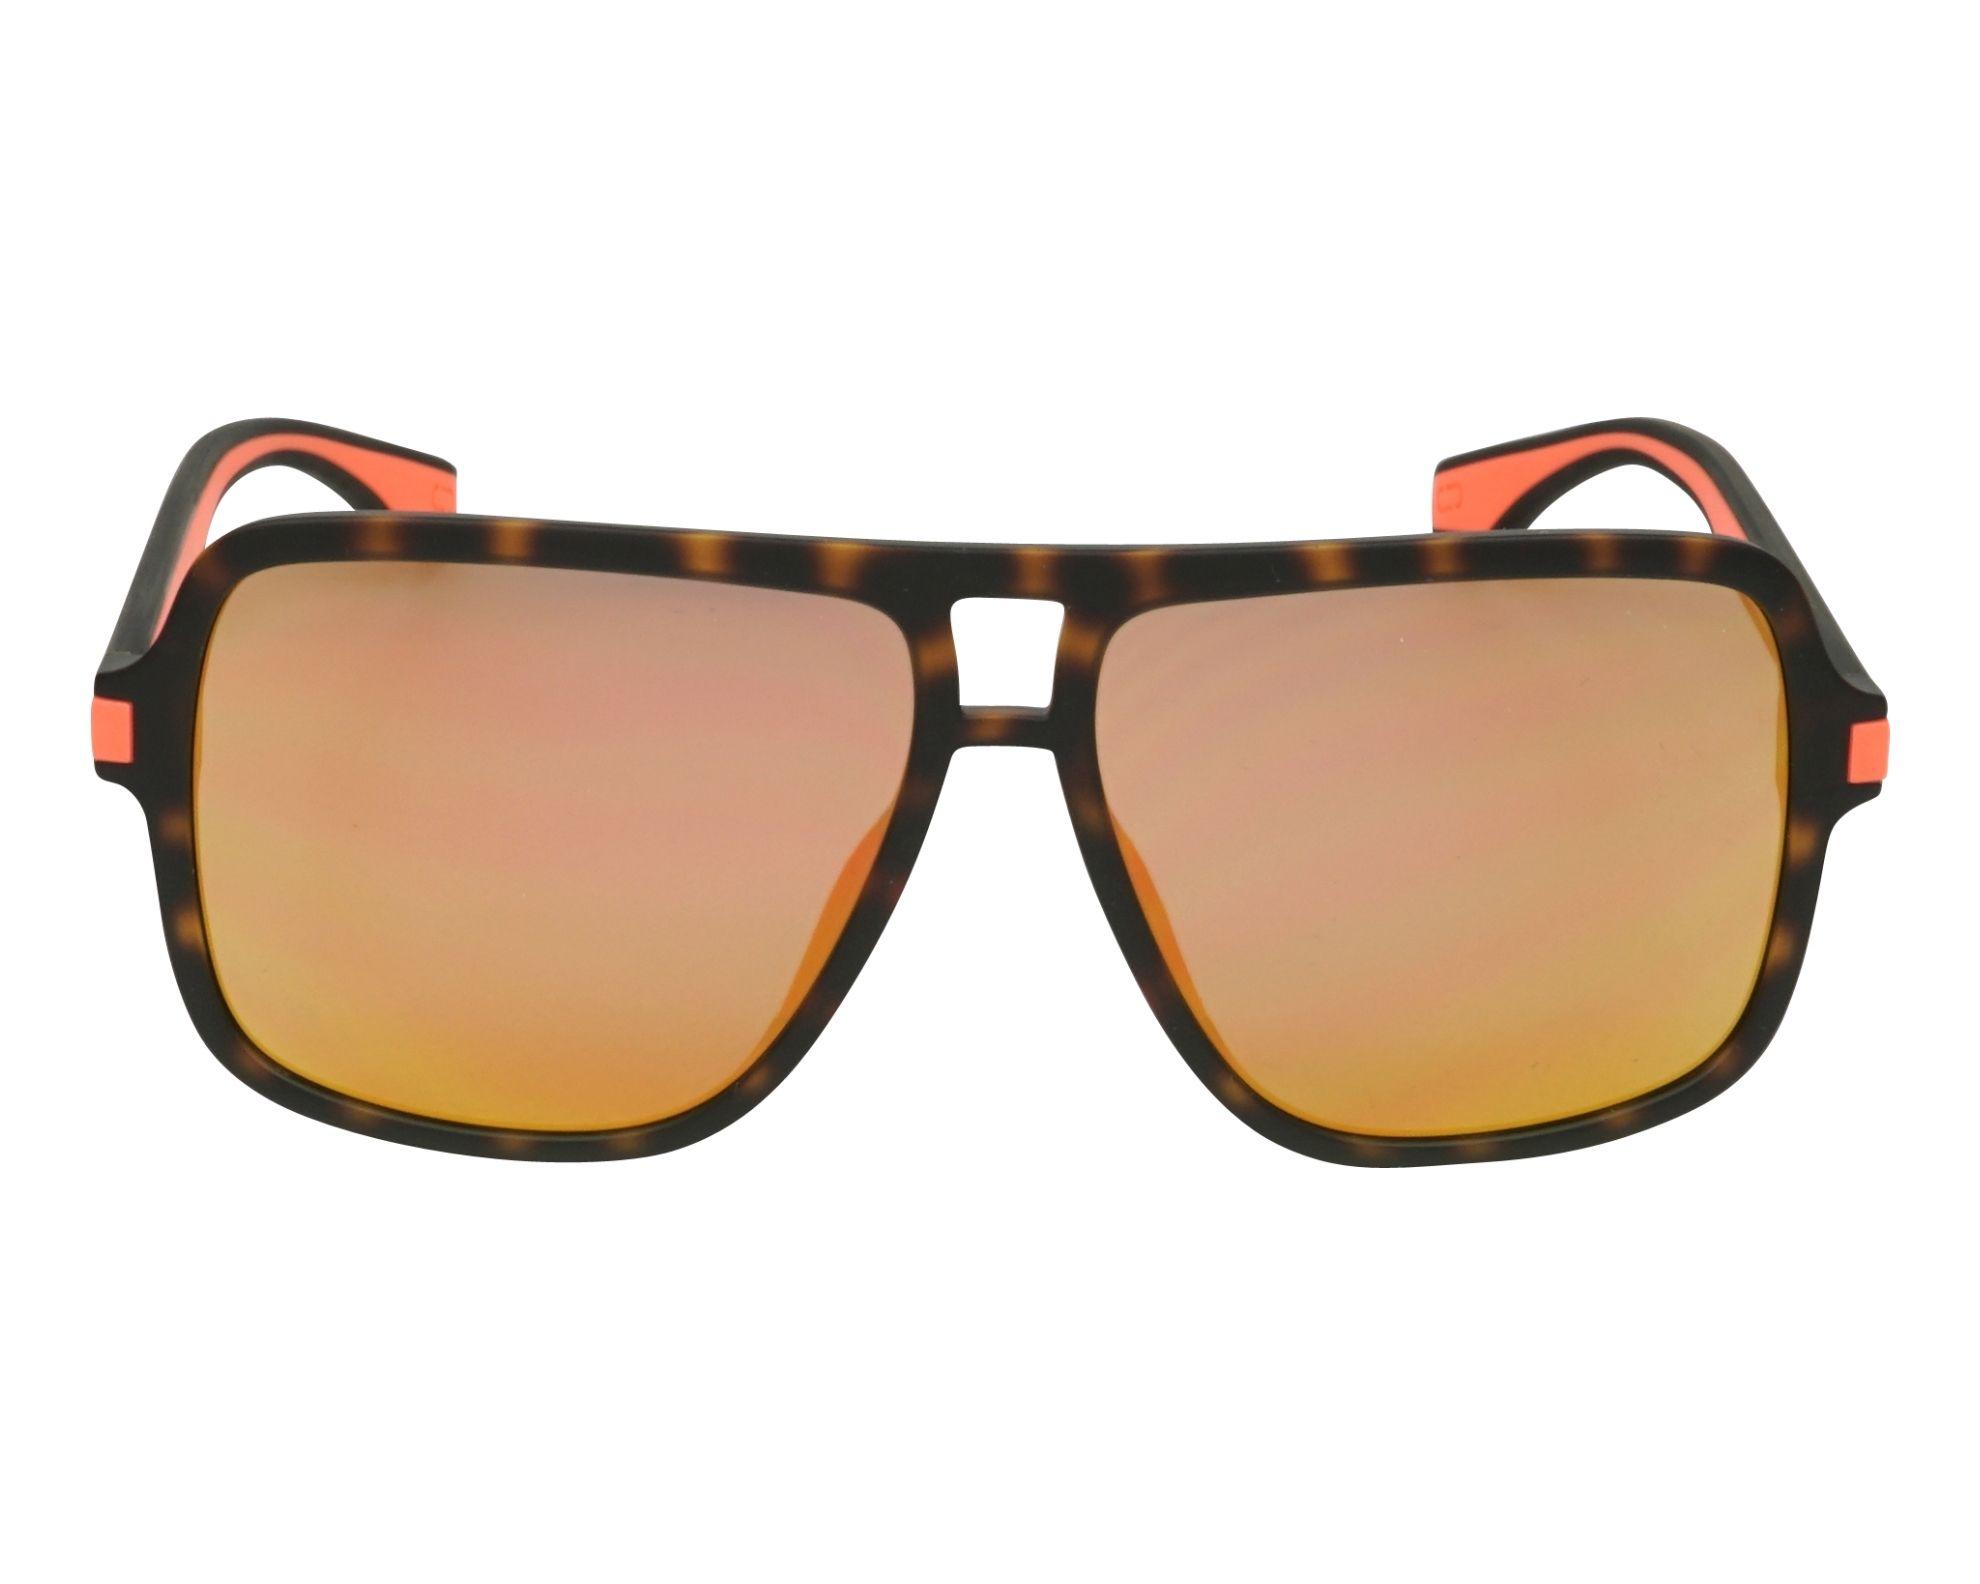 MARC JACOBS Marc Jacobs Sonnenbrille » MARC 288/S«, orange, L9G/UW - orange/orange